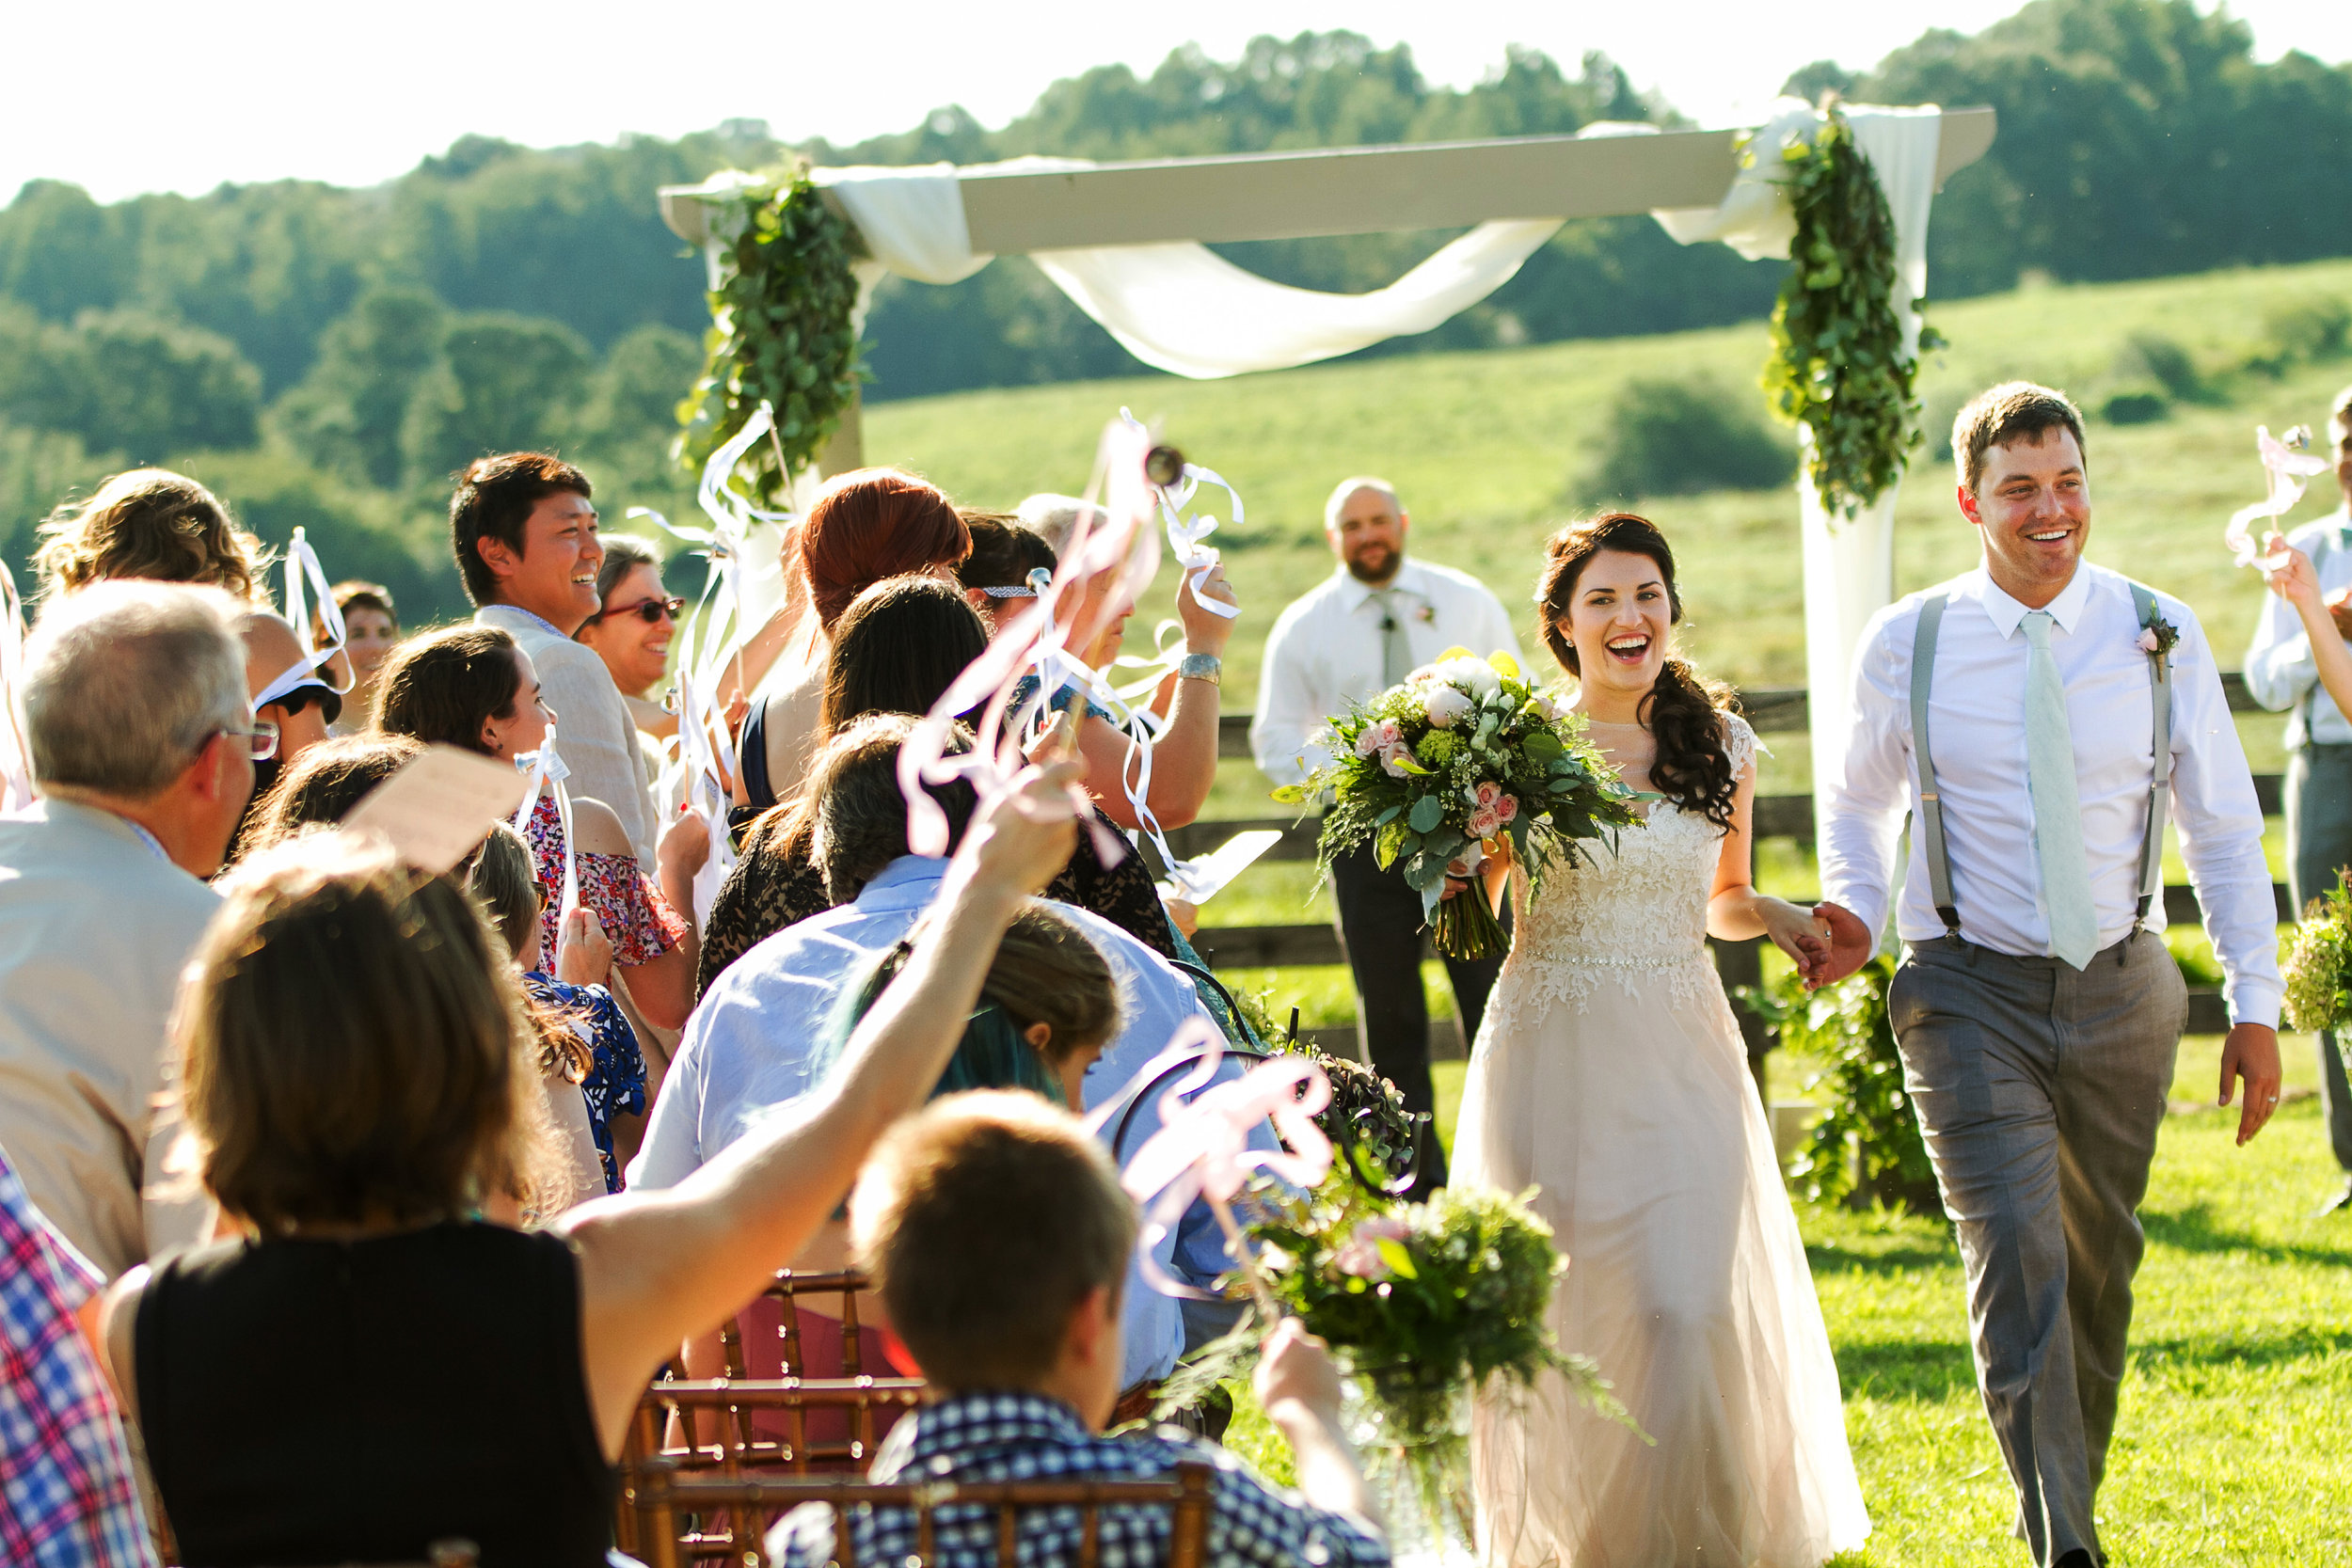 milton-wedding-photography-0107.jpg